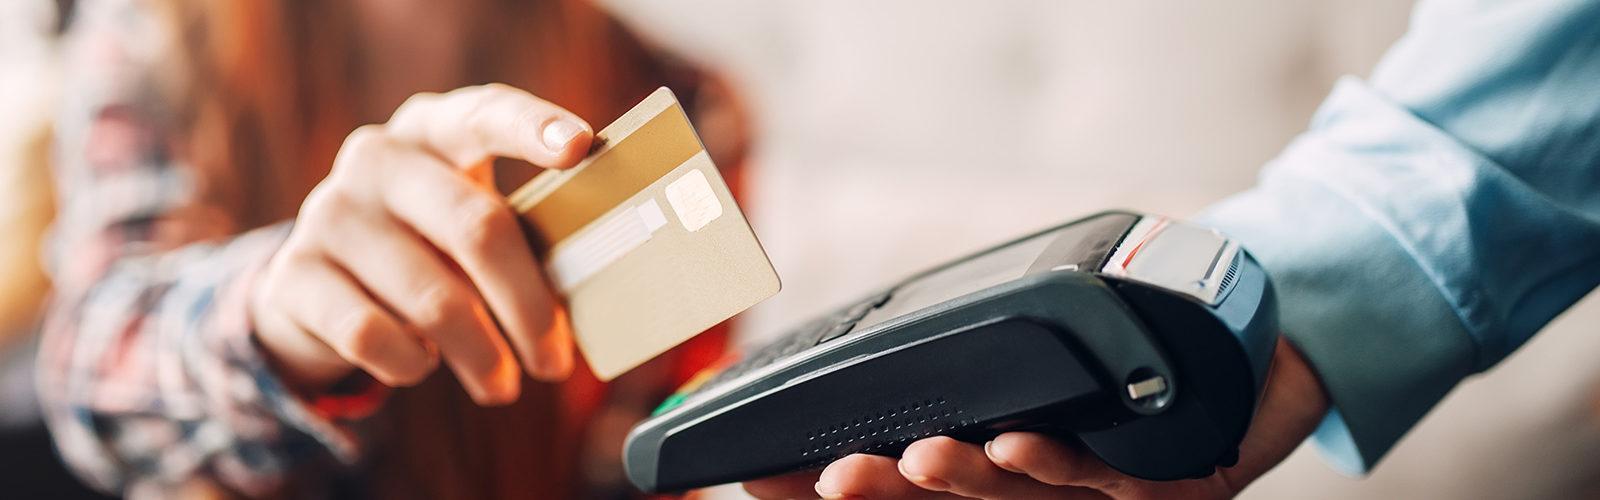 utiliser-carte-bancaire-usa-2